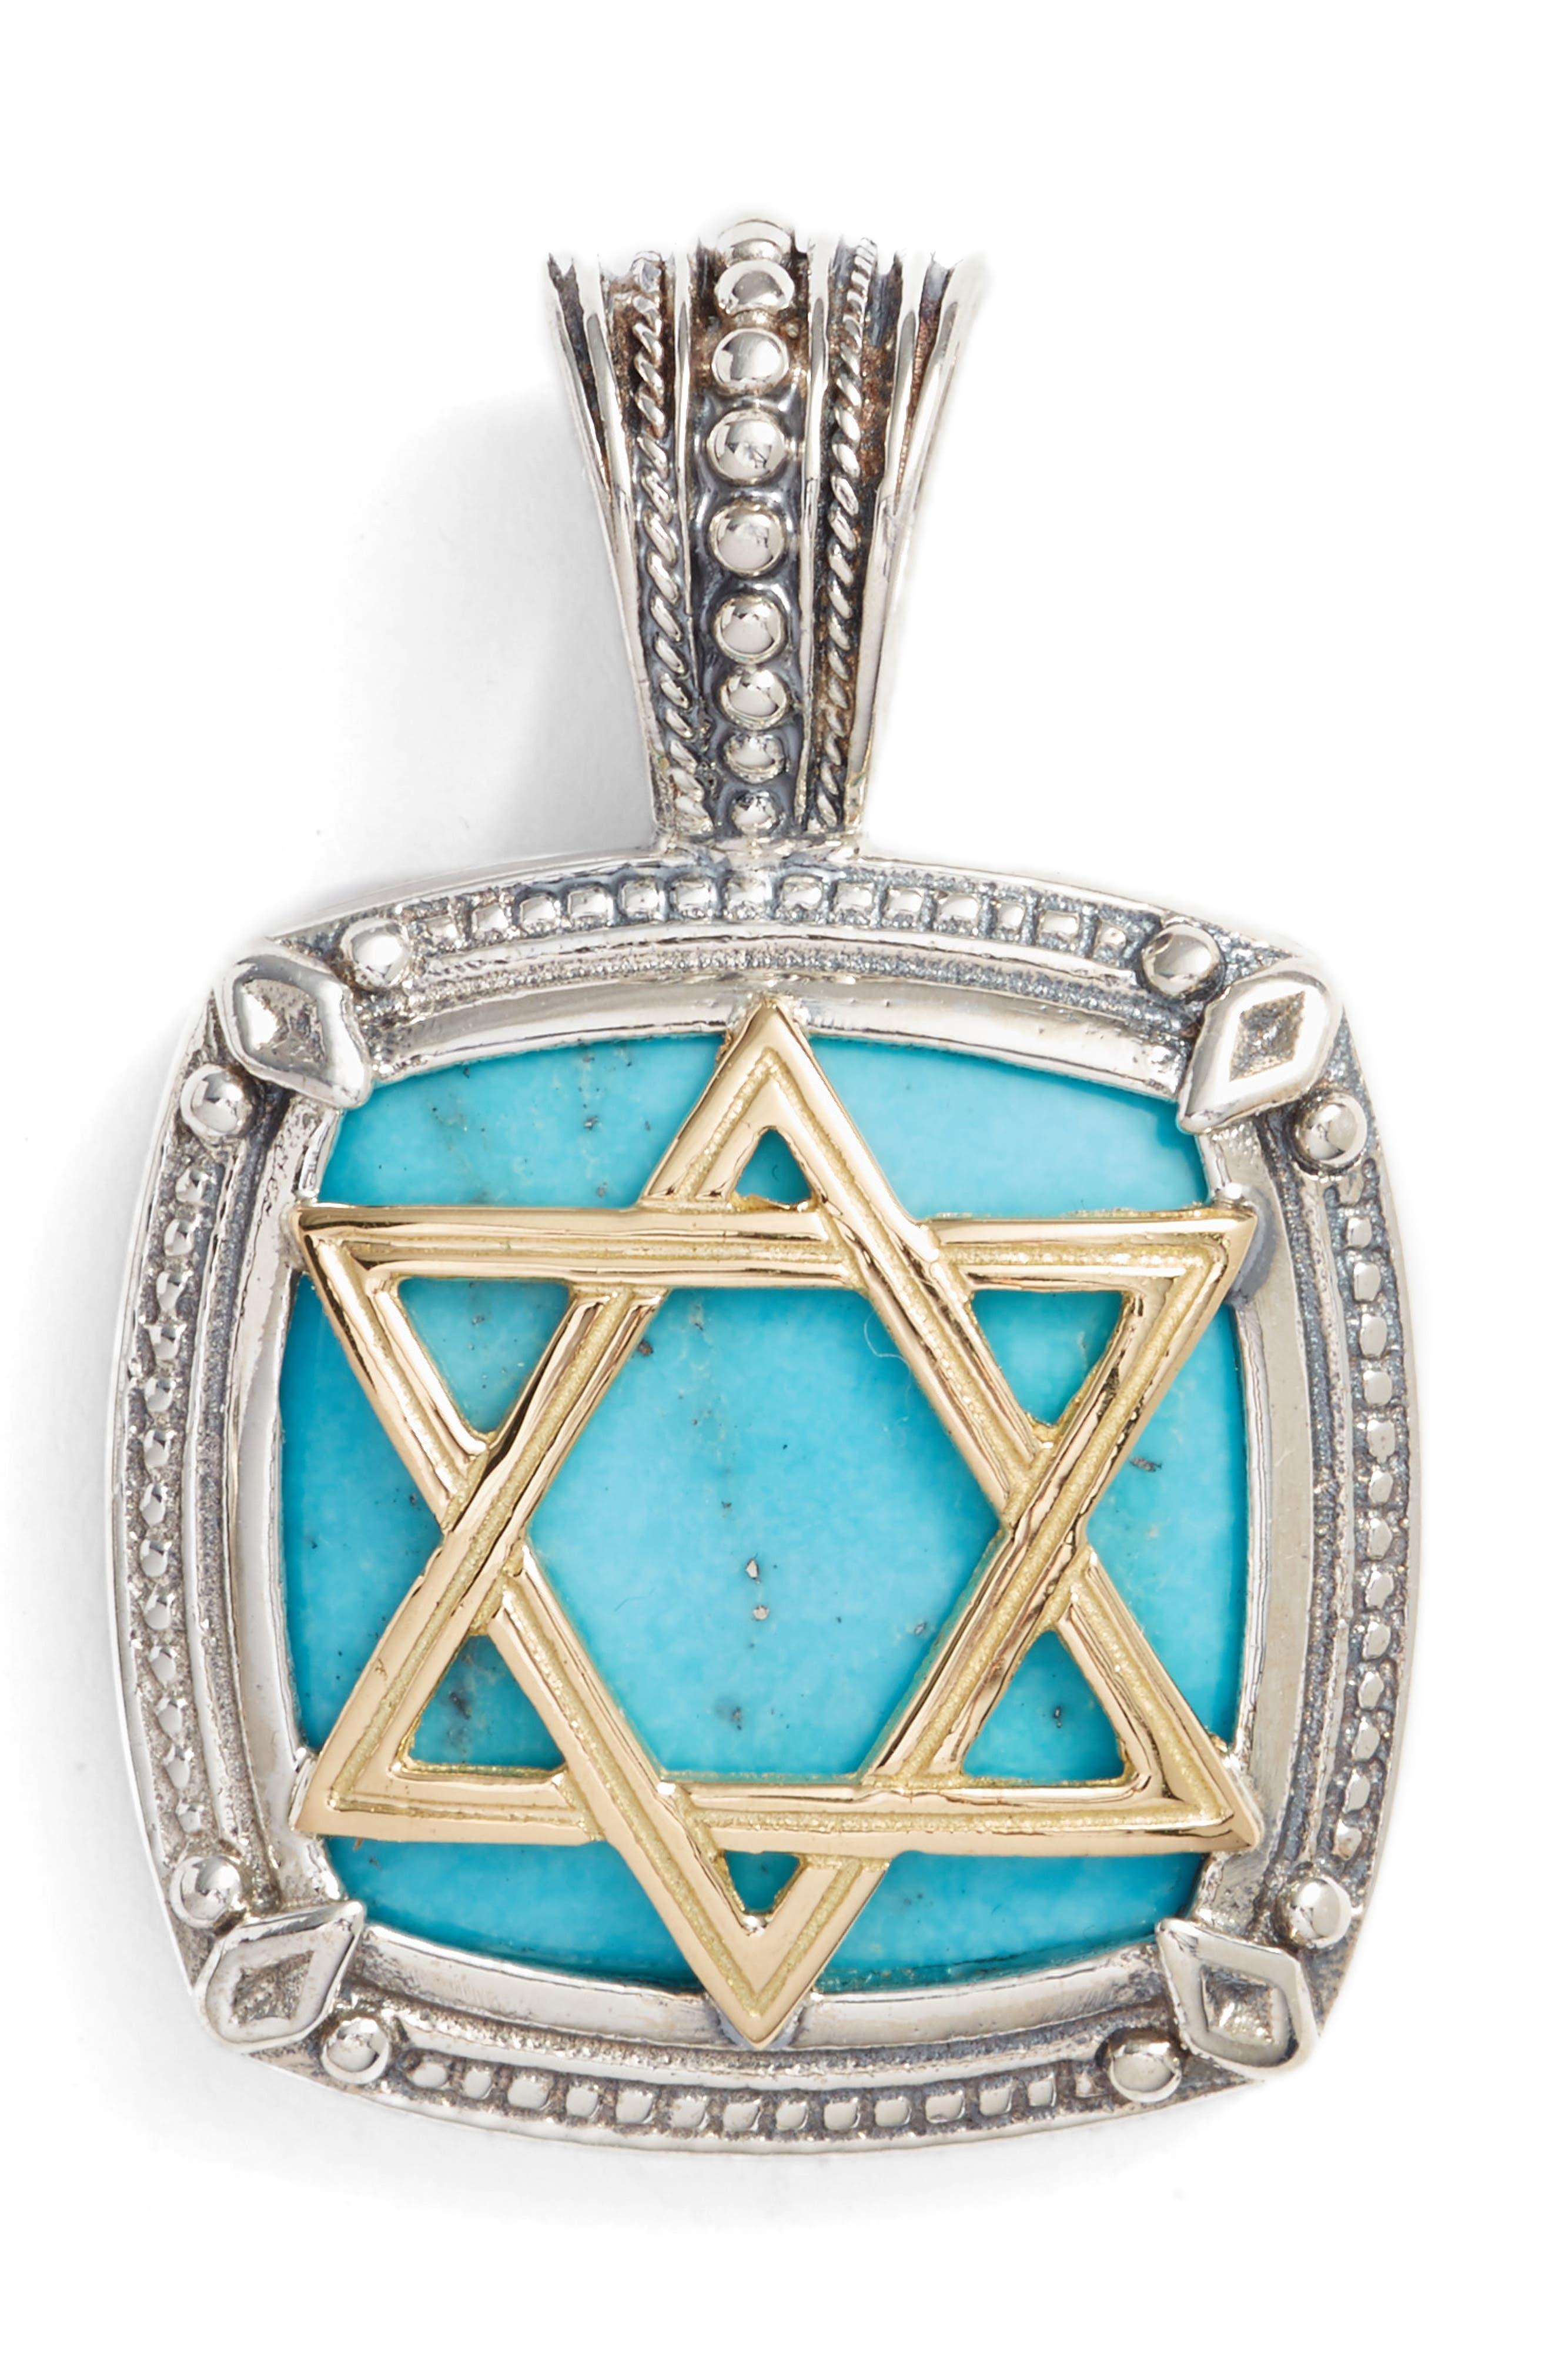 Heonos Star of David Turquoise Pendant,                             Main thumbnail 1, color,                             400